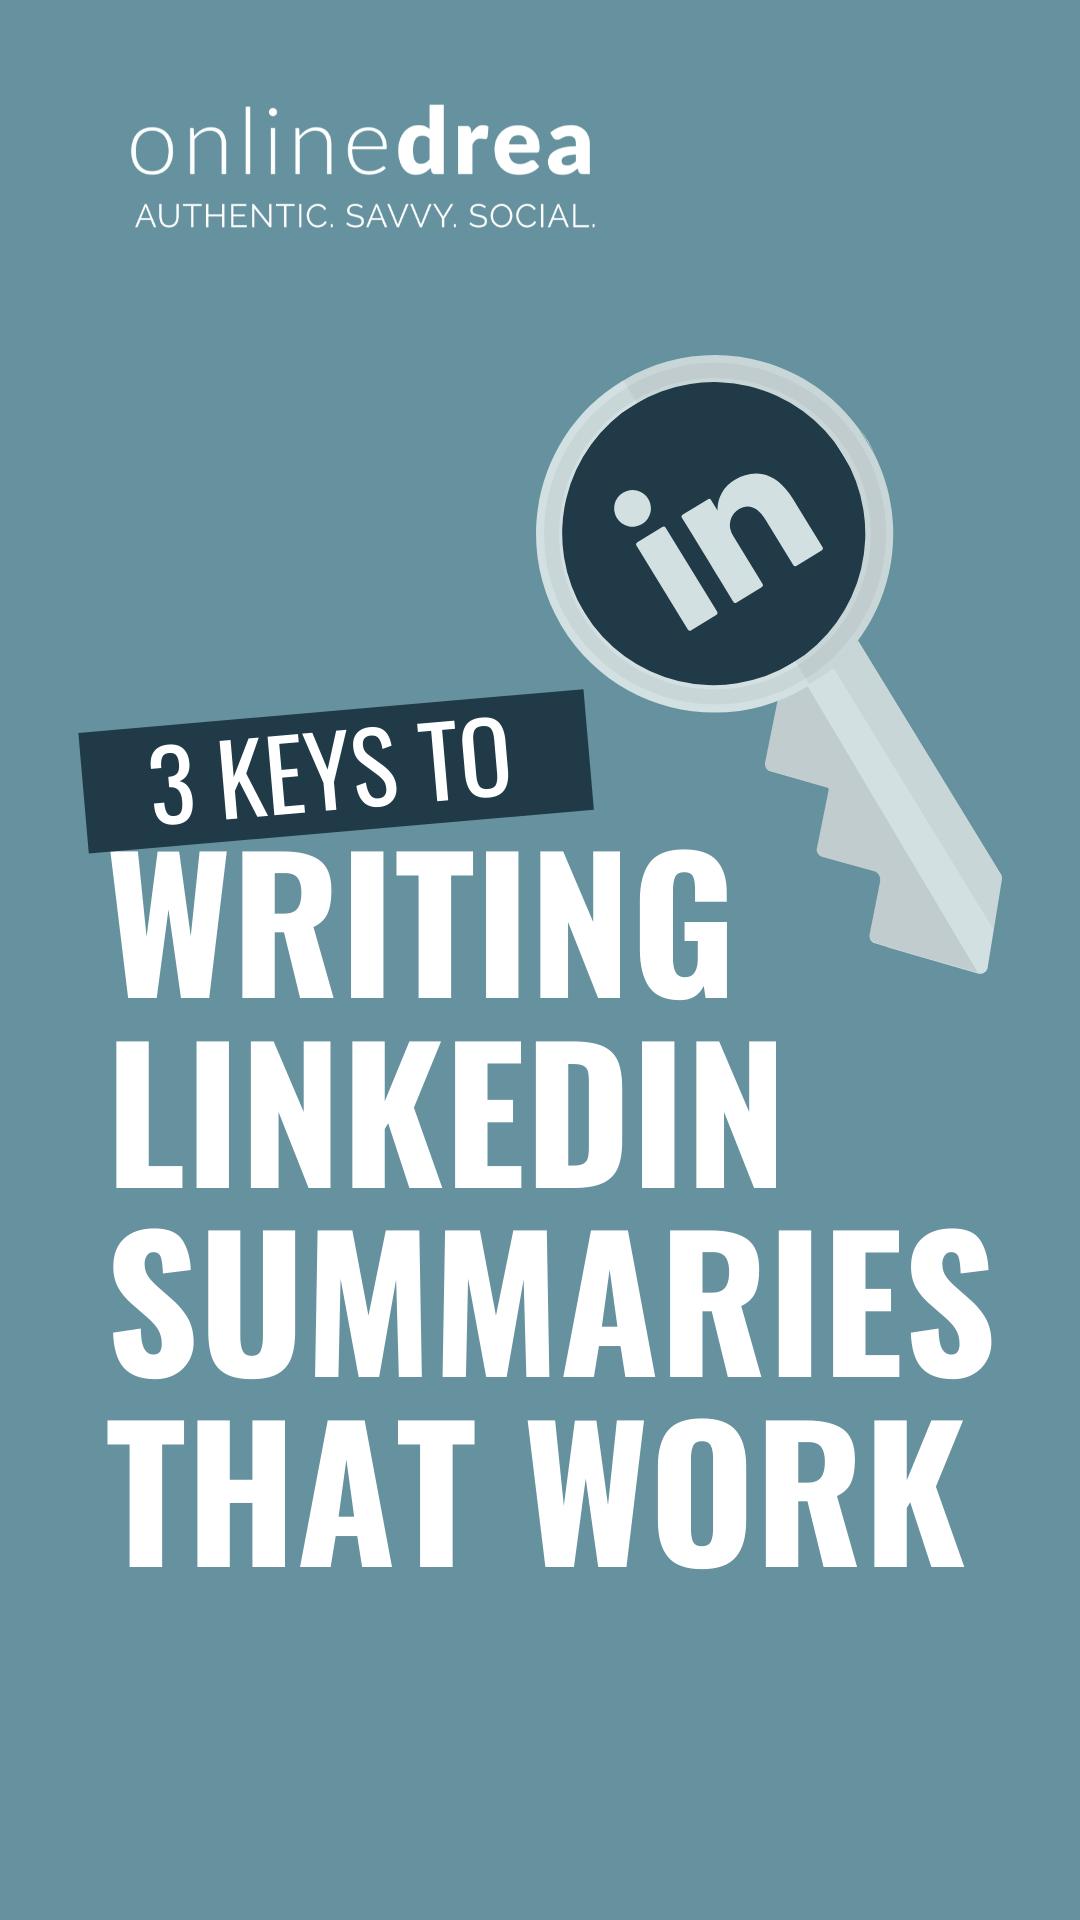 3 Keys to Writing LinkedIn Summaries that WORK